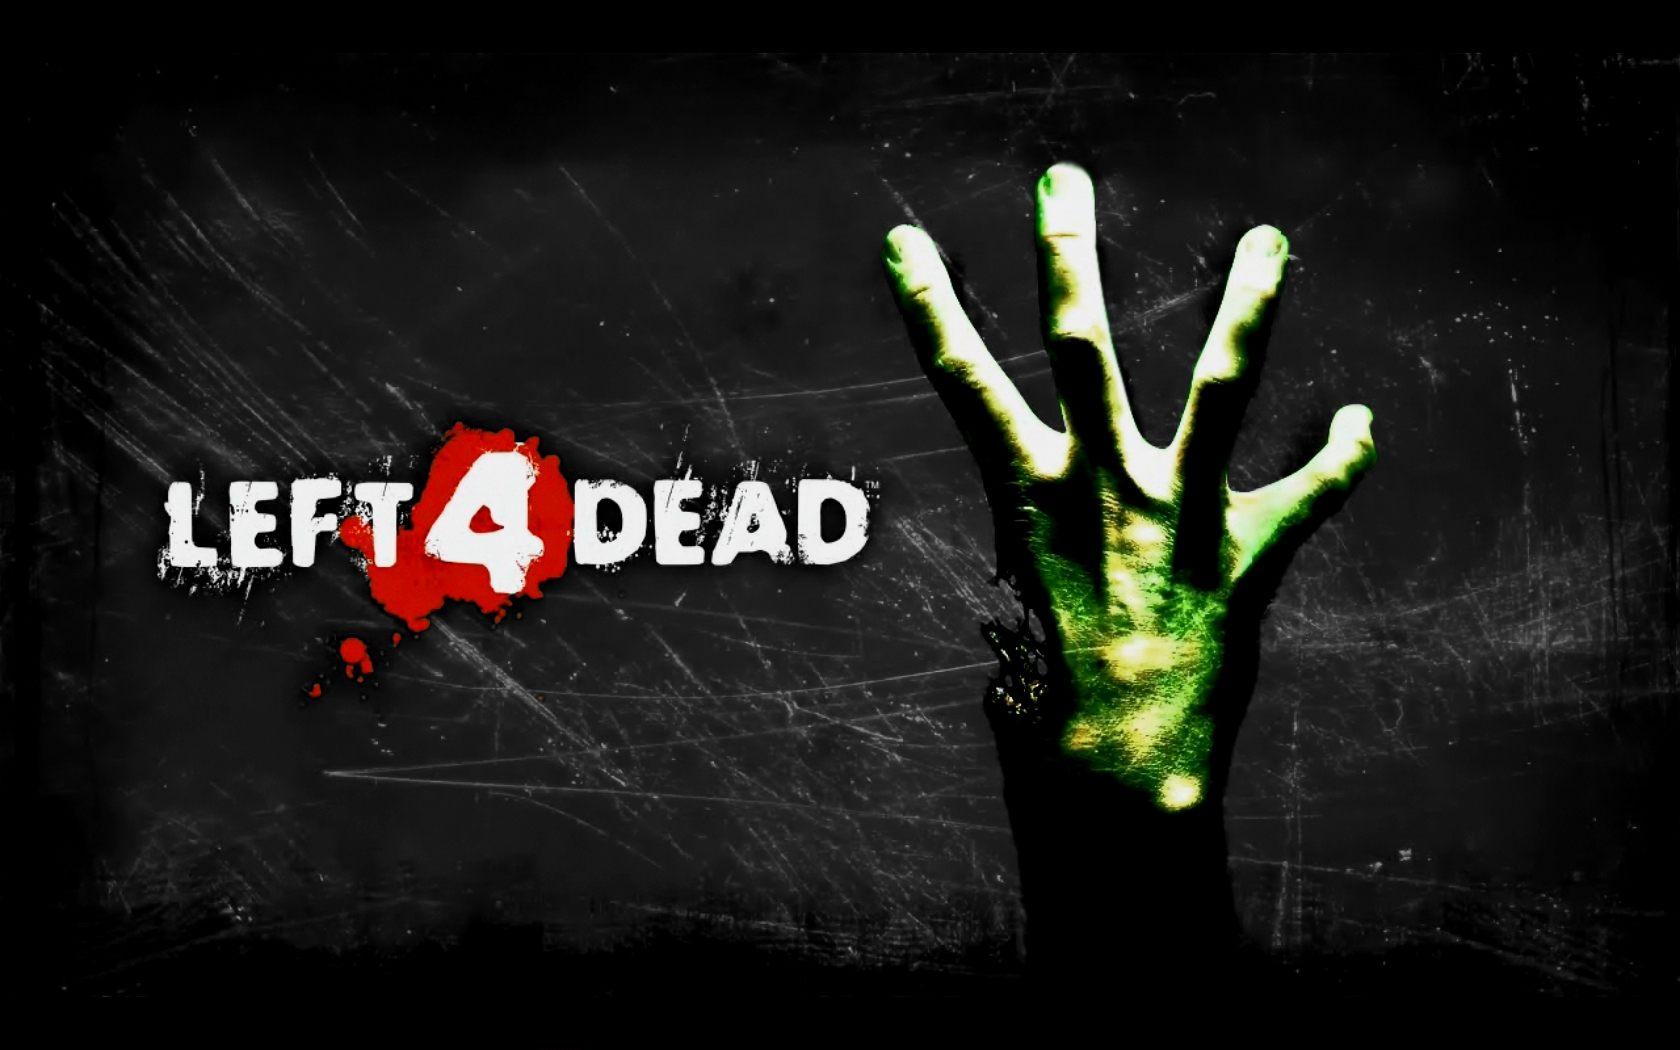 Left 4 Dead development studio back 4 blood cooperative zombie shooter